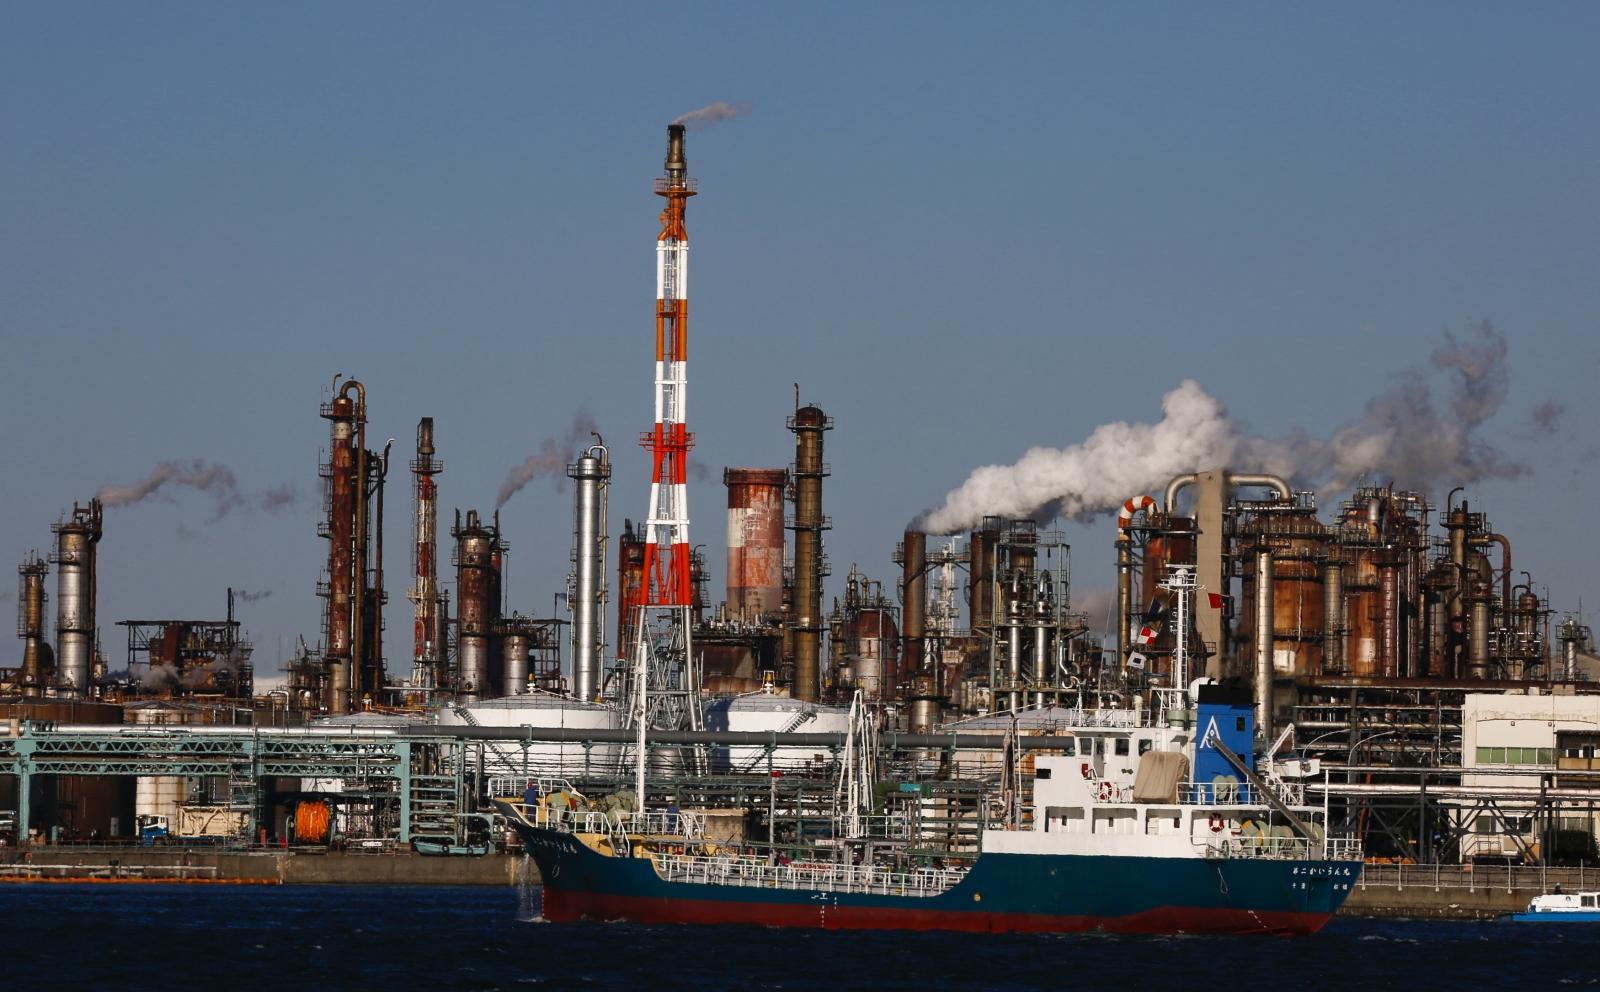 petro-industrial complex in Kawasaki near Tokyo